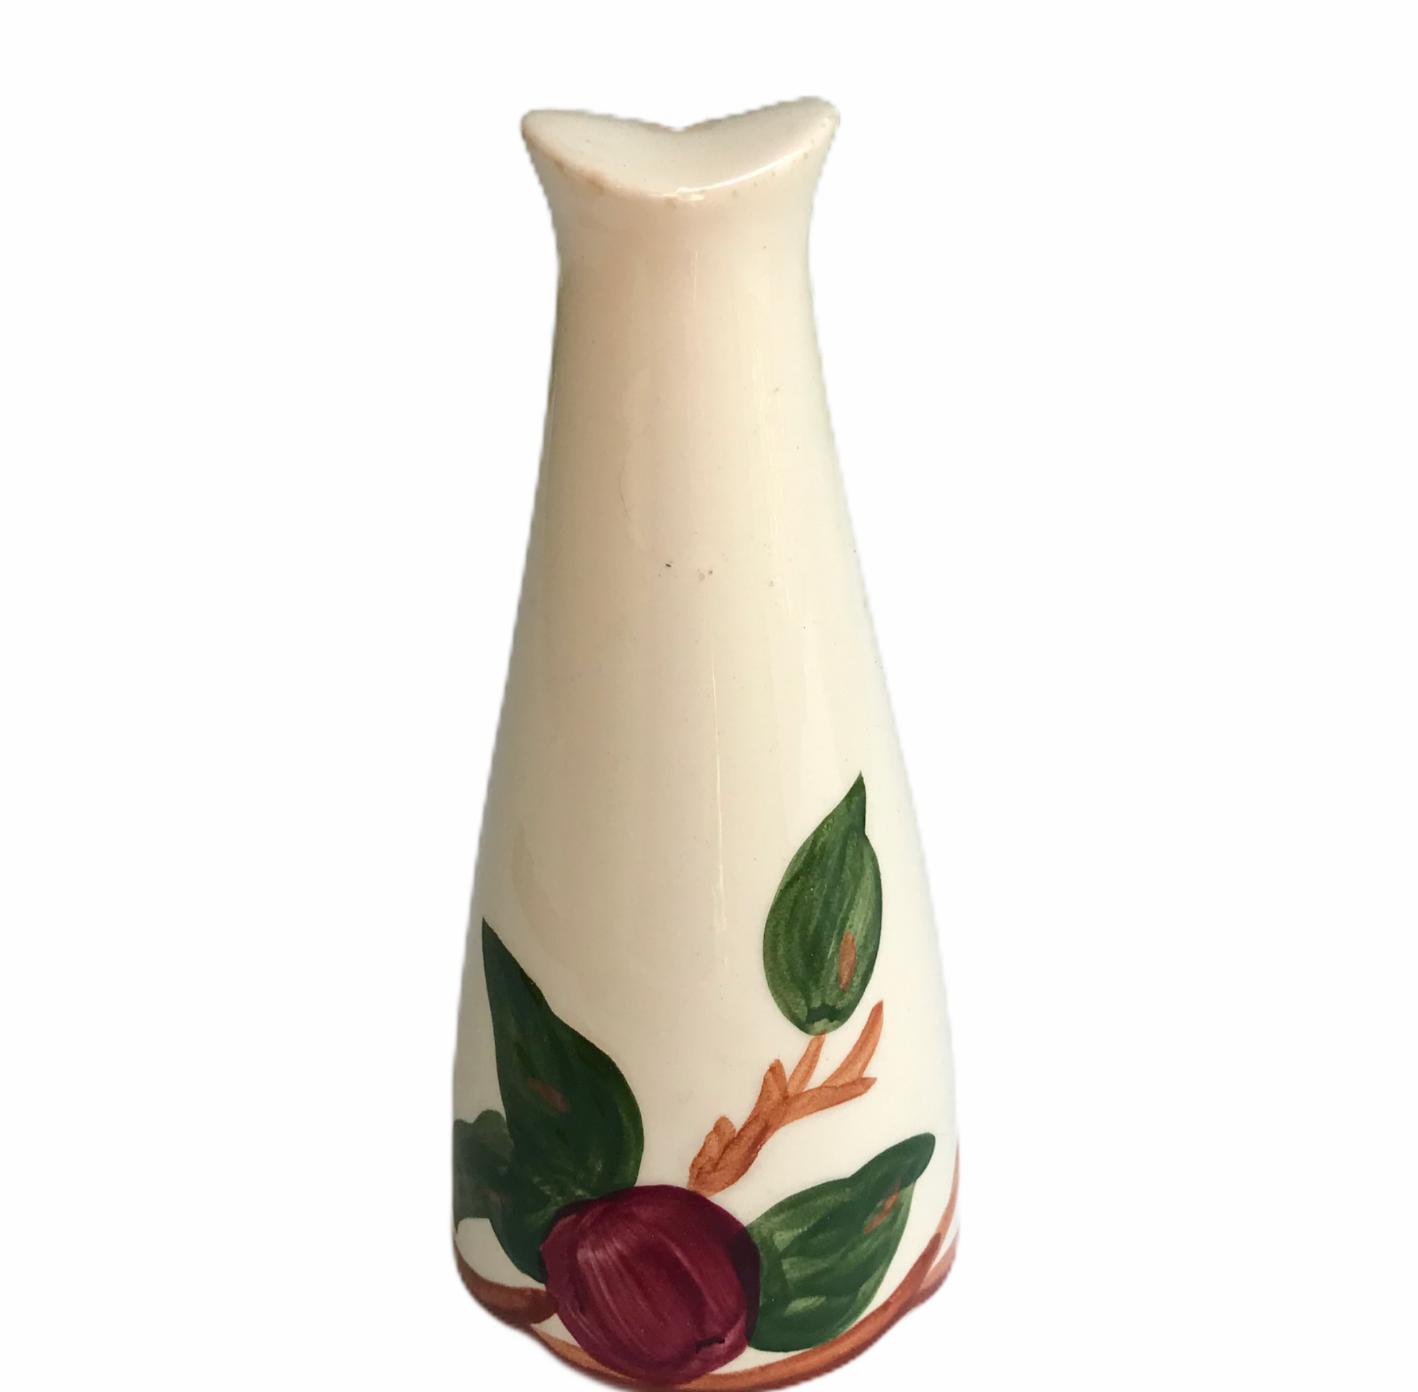 Vintage Franciscan Apple Pattern Single Tall Salt Shaker Made In California USA - $16.68